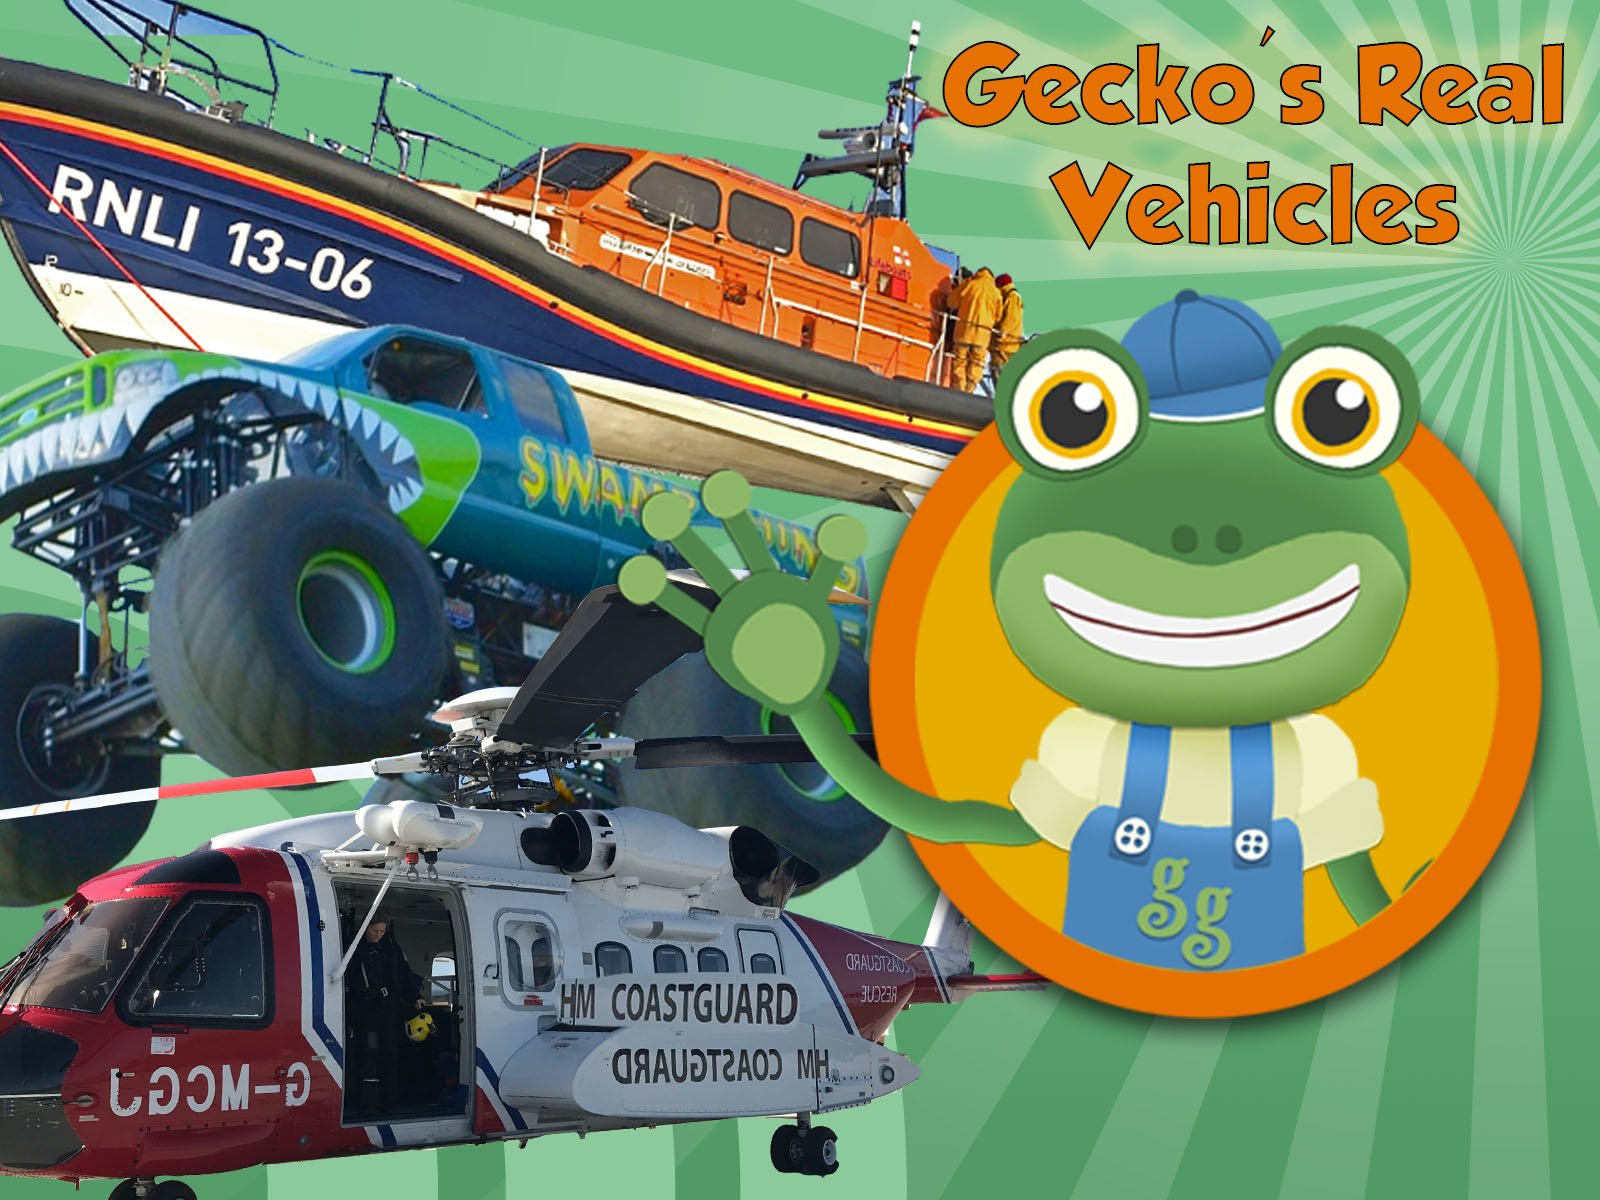 Gecko's Real Vehicles - Season 1